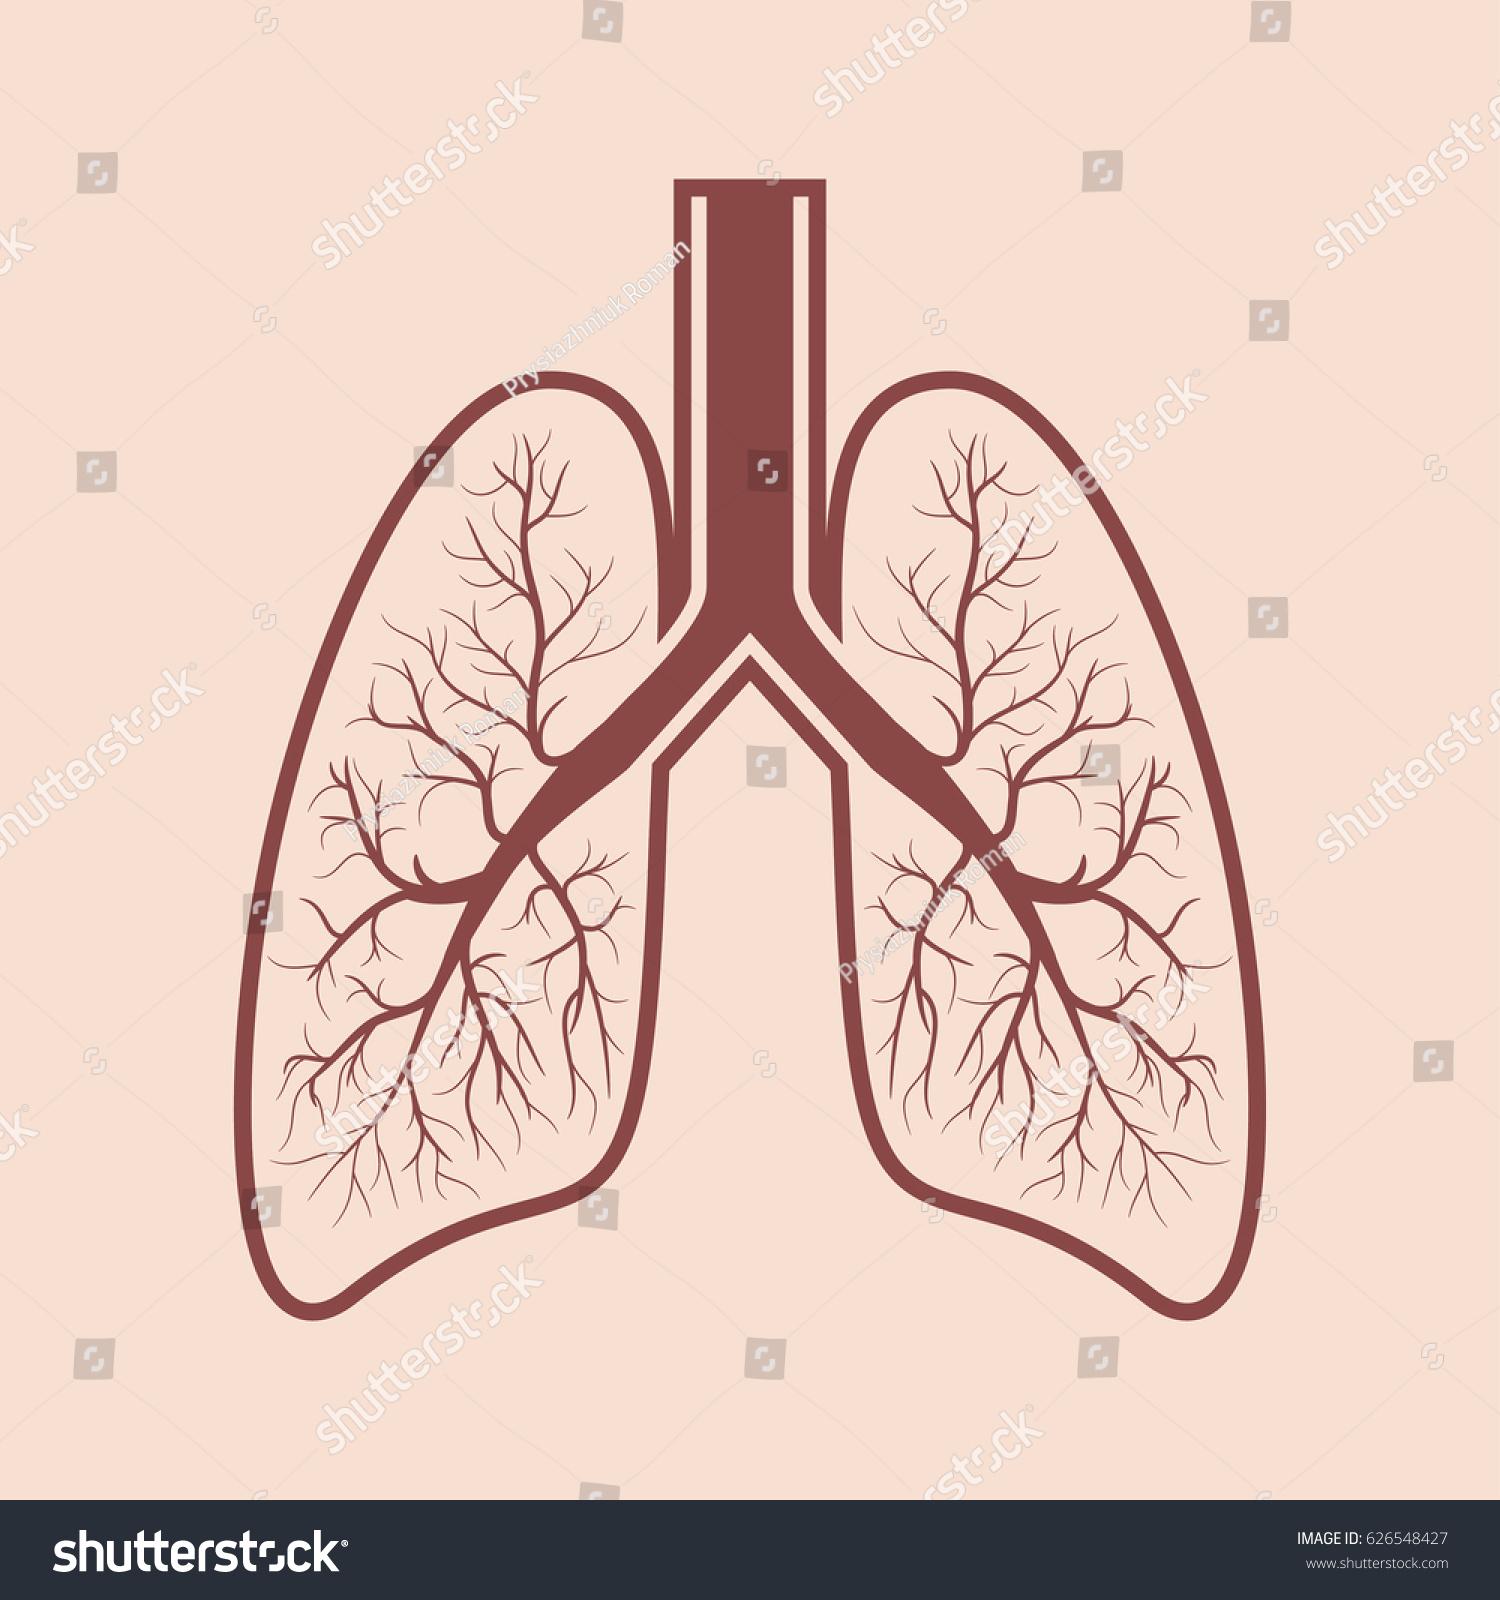 Human Lung Anatomy Respiratory System Graphics Stock Vector ...